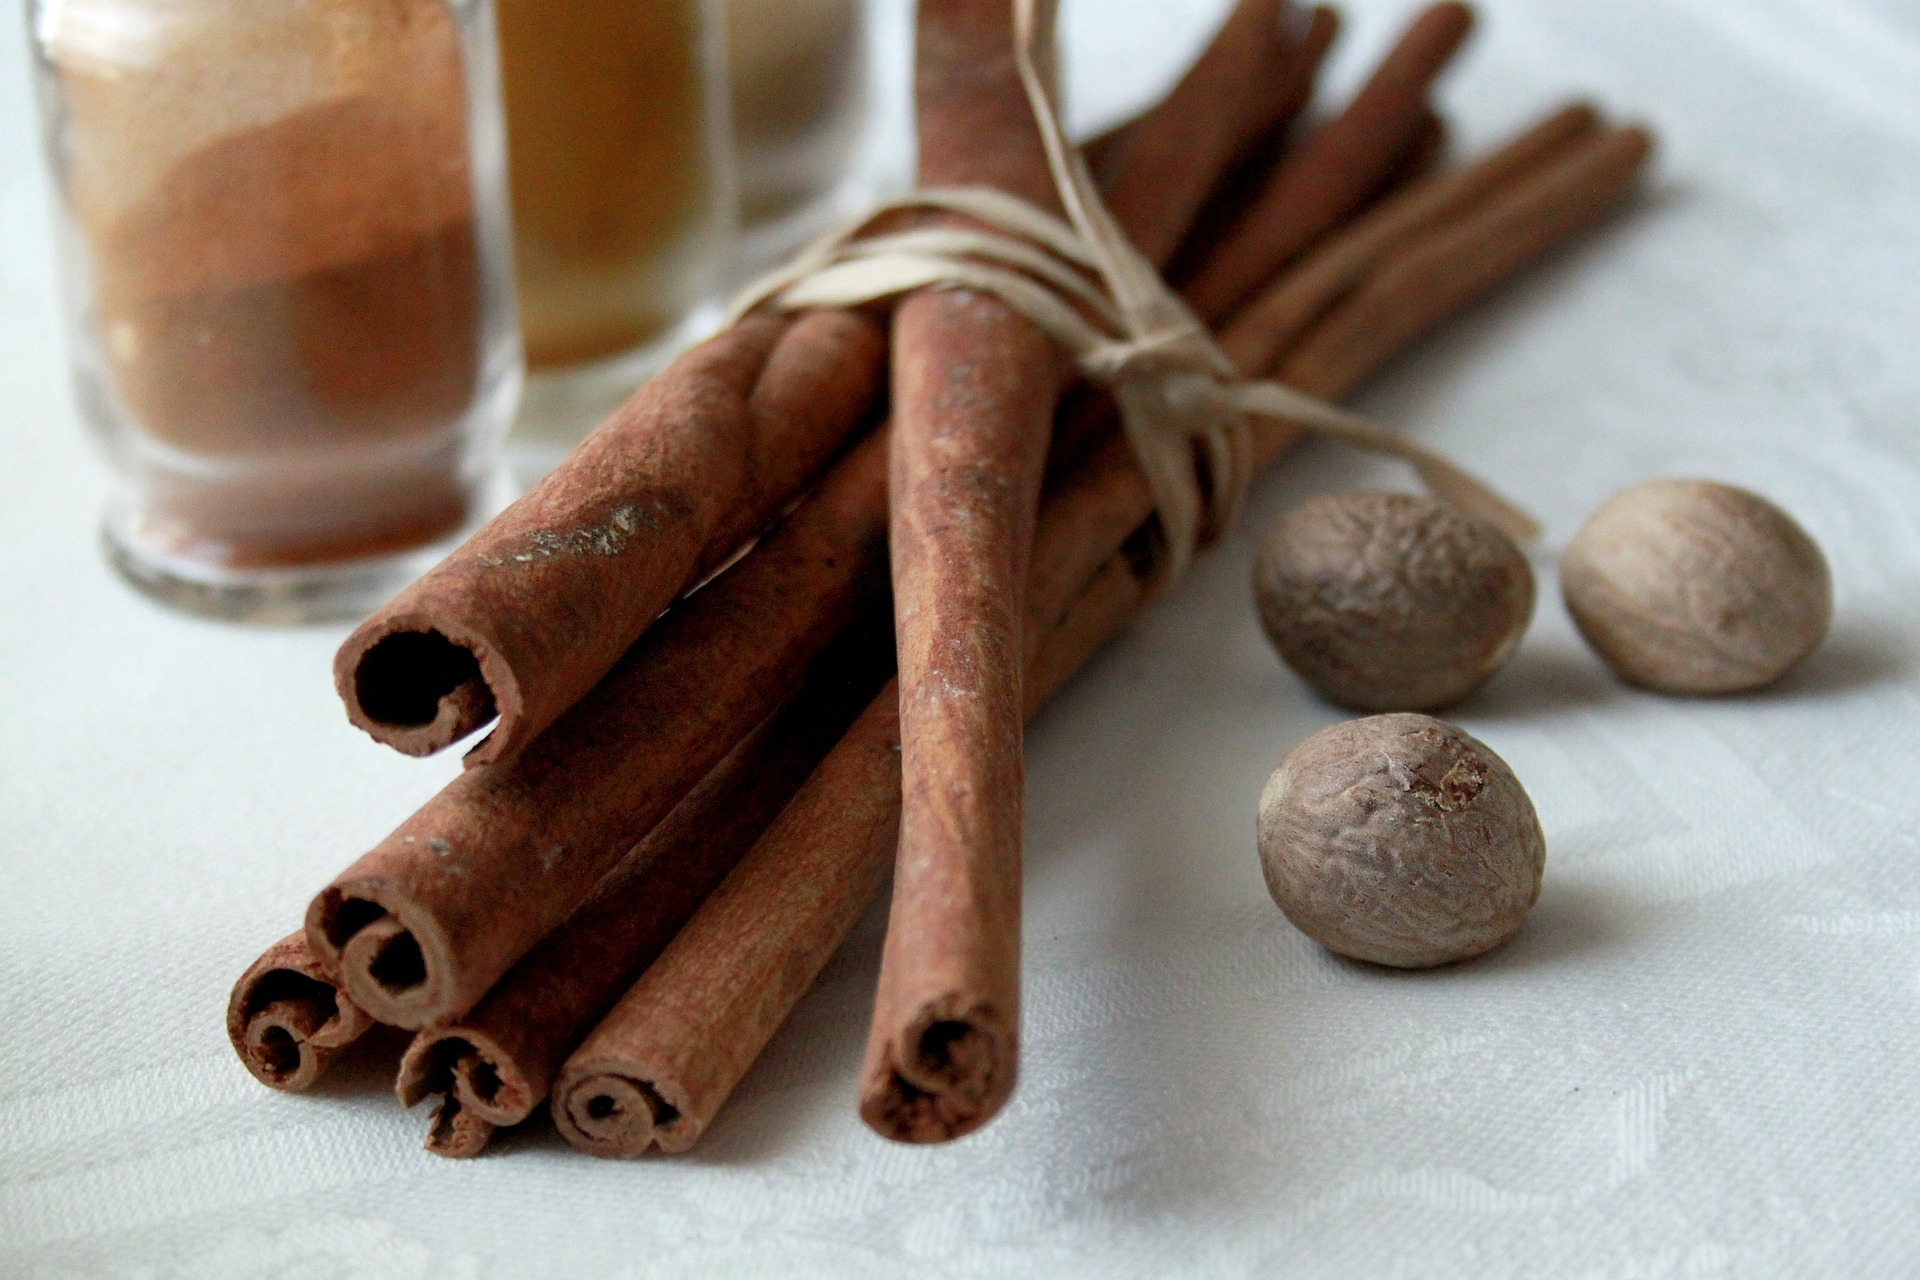 pumpkin spice spices cinnamon nutmeg for pumpkin coconut chocolate chip muffins on www.sugarbananas.com